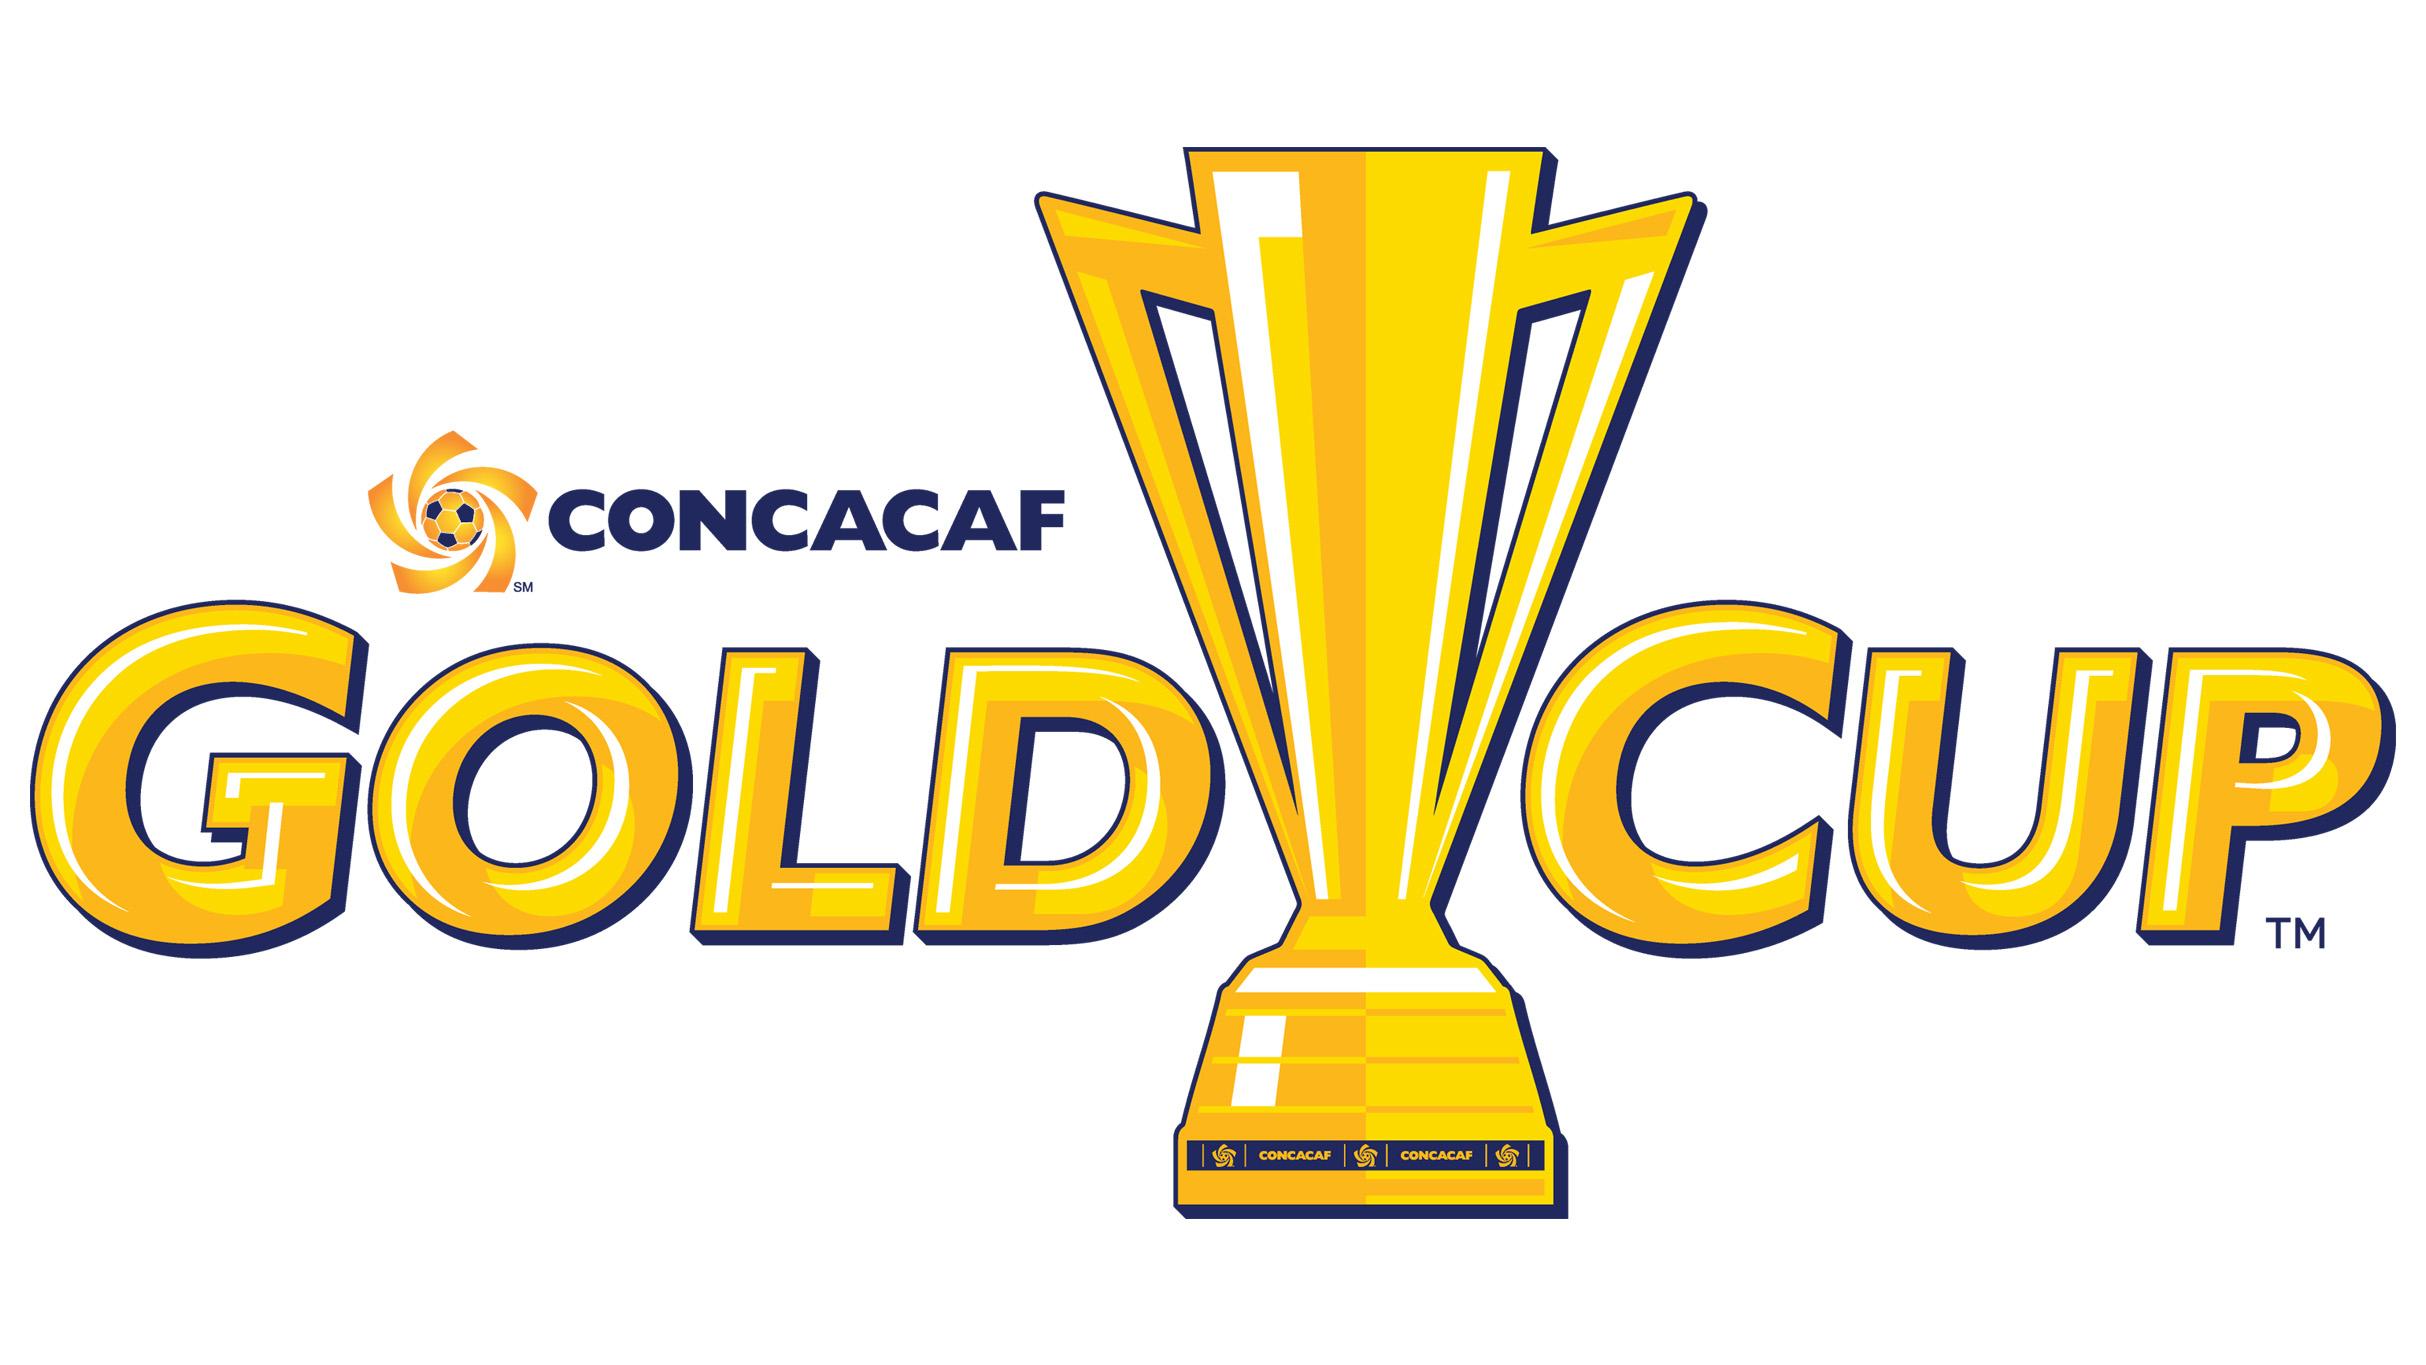 CGC17-2448_Gold_Cup_TM_Graphic.jpg